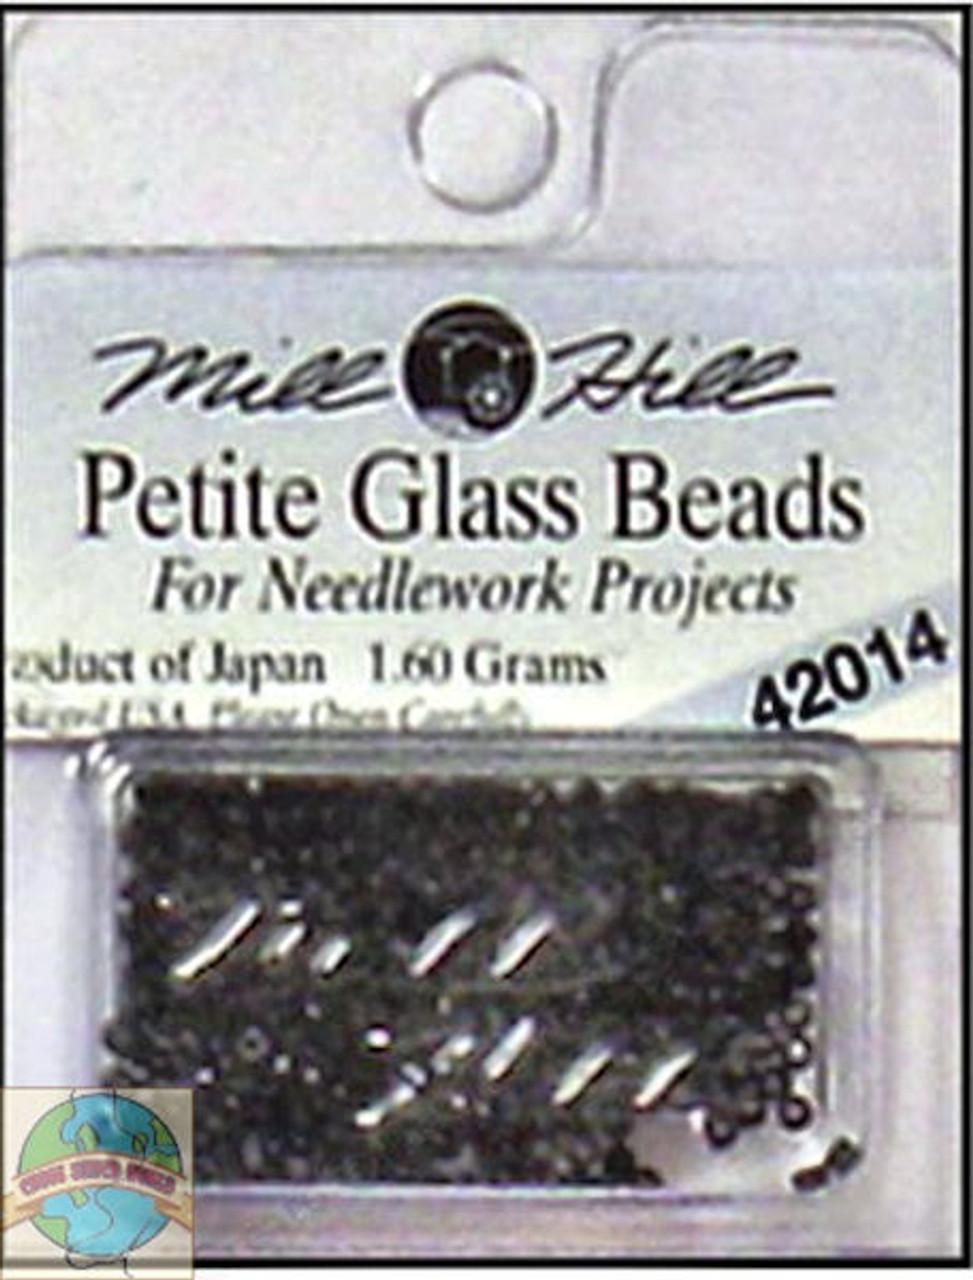 Mill Hill Petite Glass Beads 1.60g Black #42014